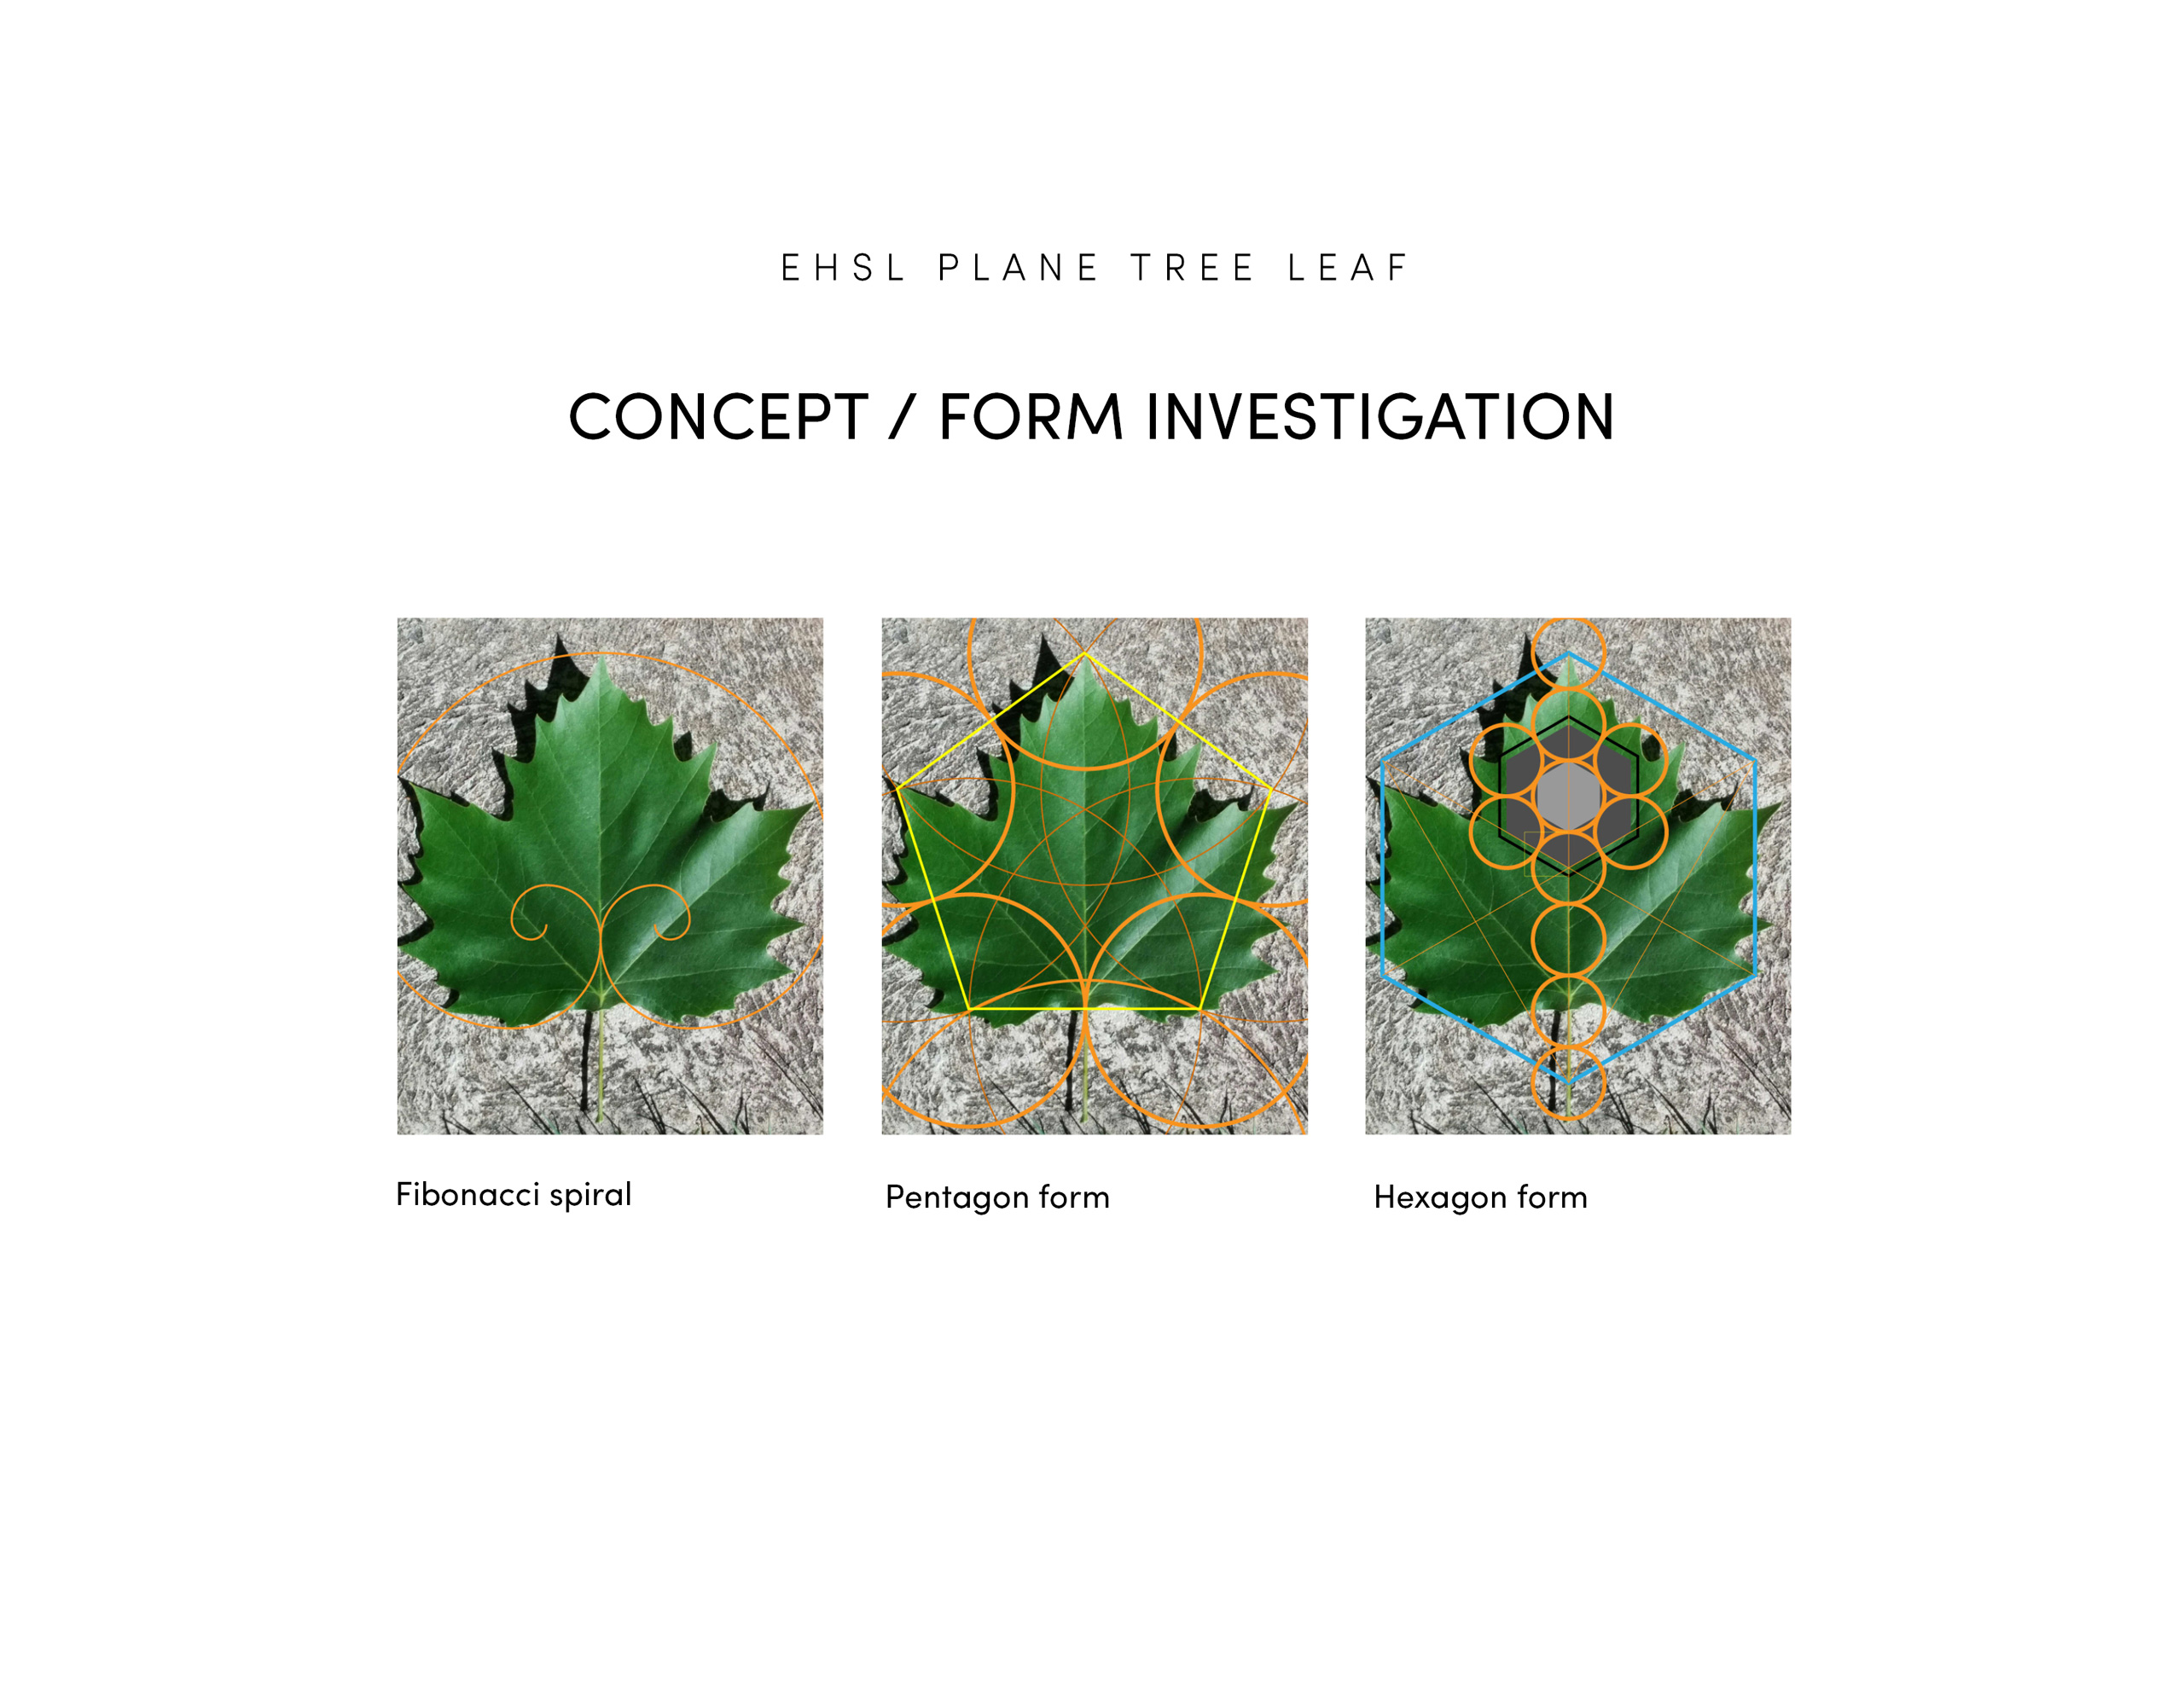 EHSL Plane Tree Leaf Geometry Diagrams